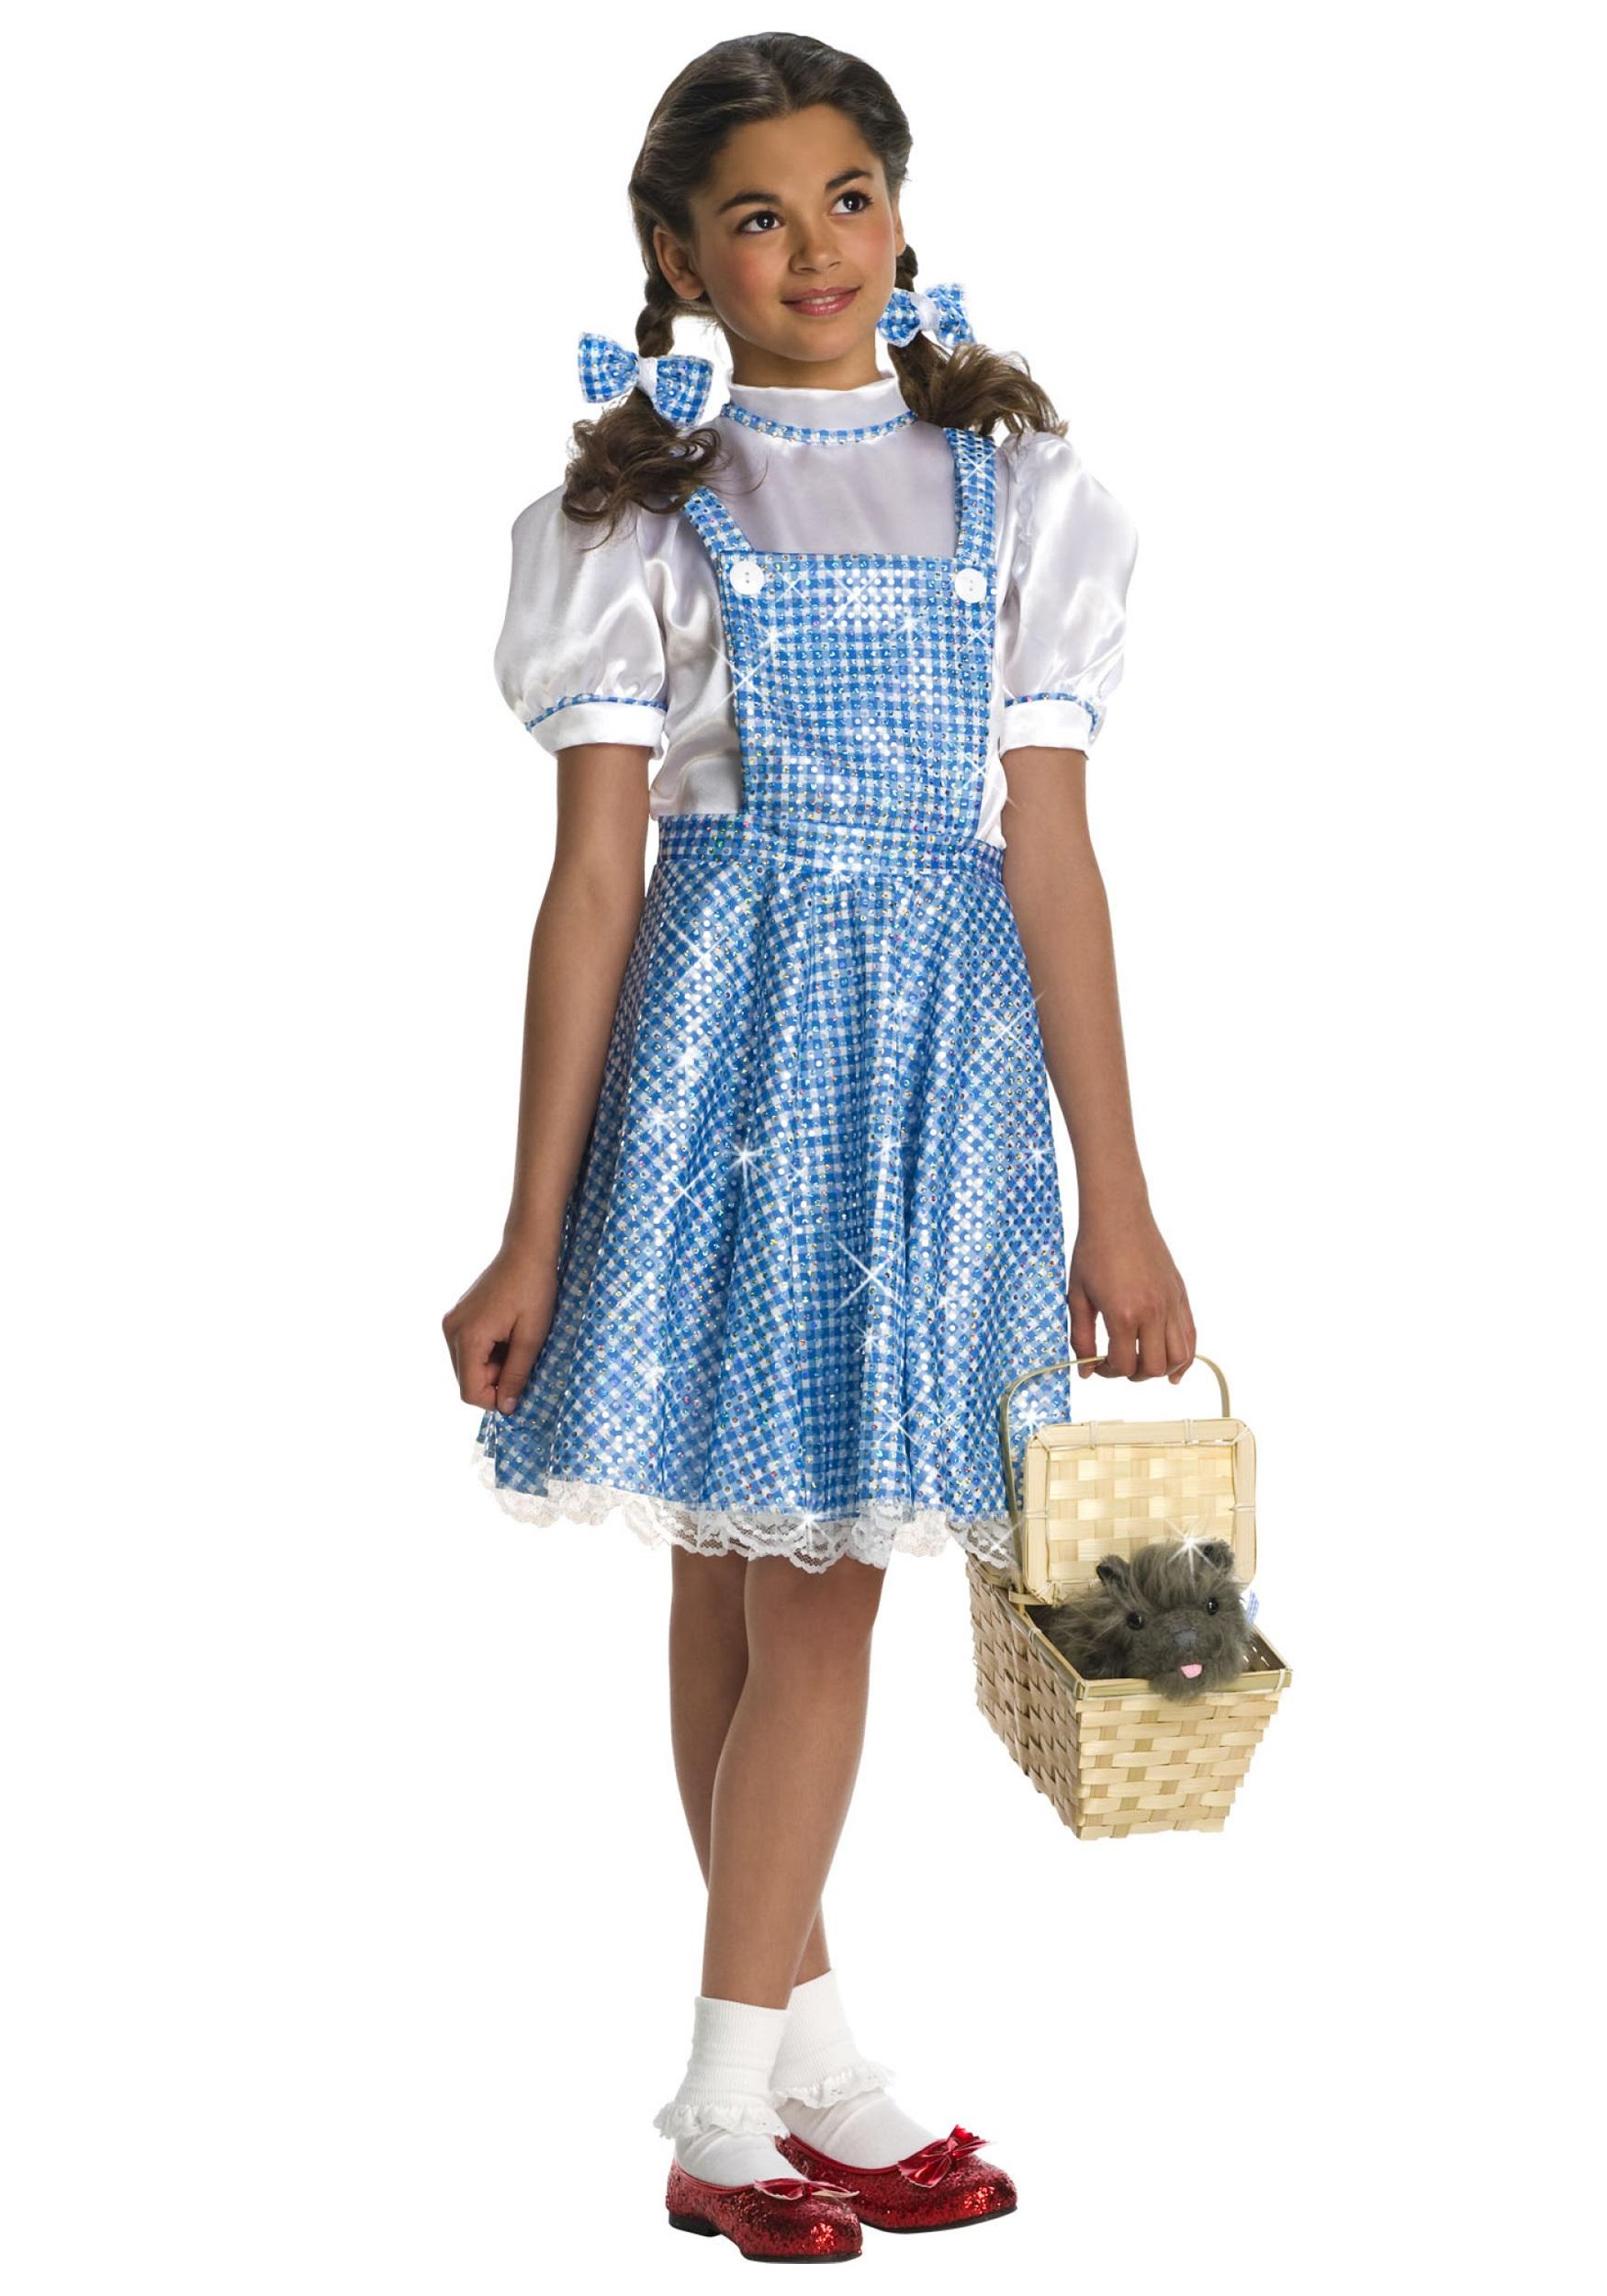 Girls Halloween Costumes - HalloweenCostumes.com